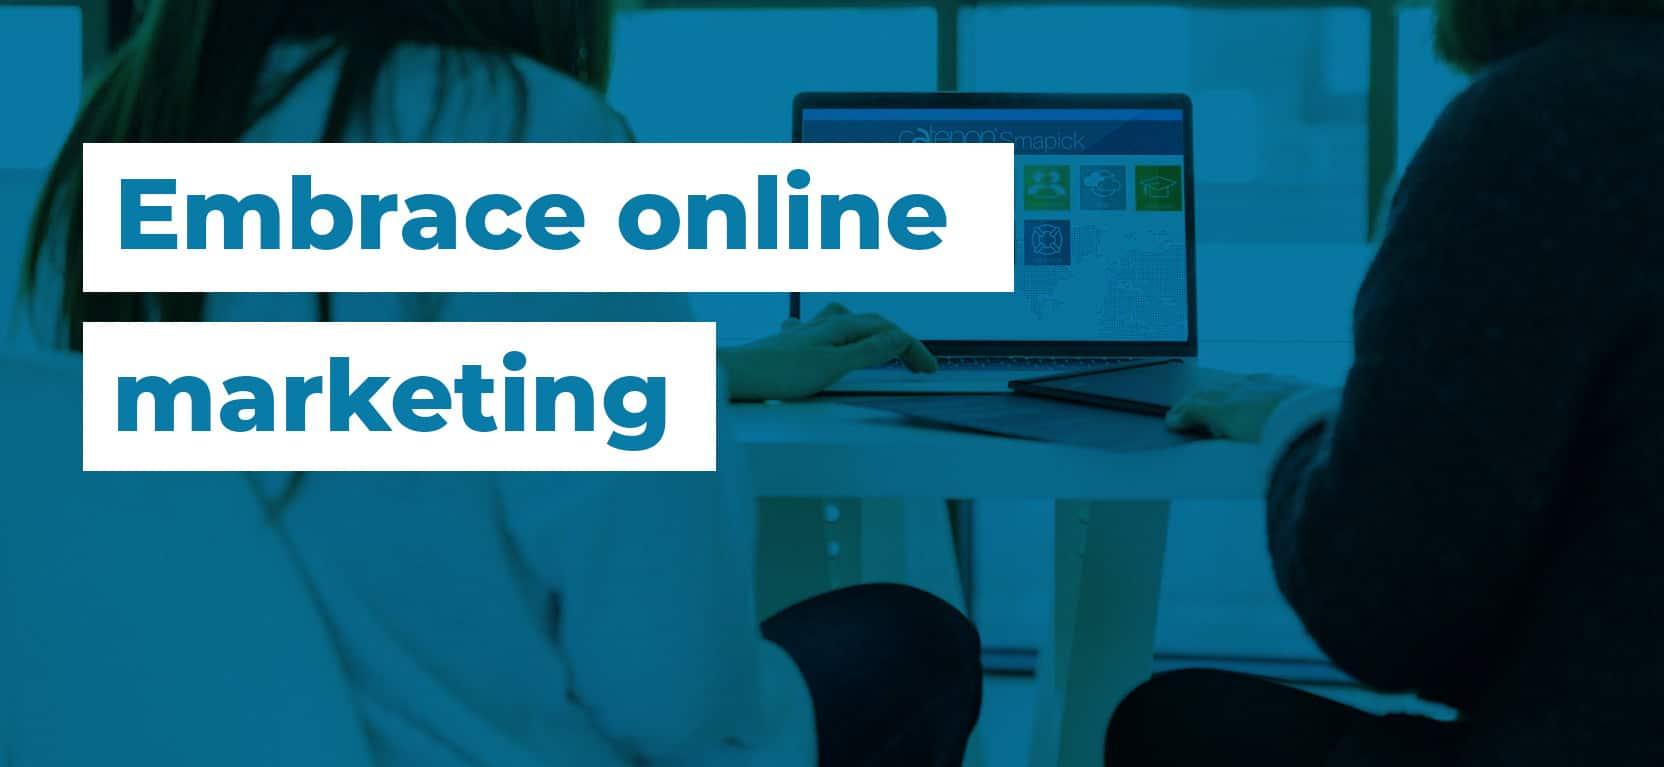 05 Embrace online marketing3